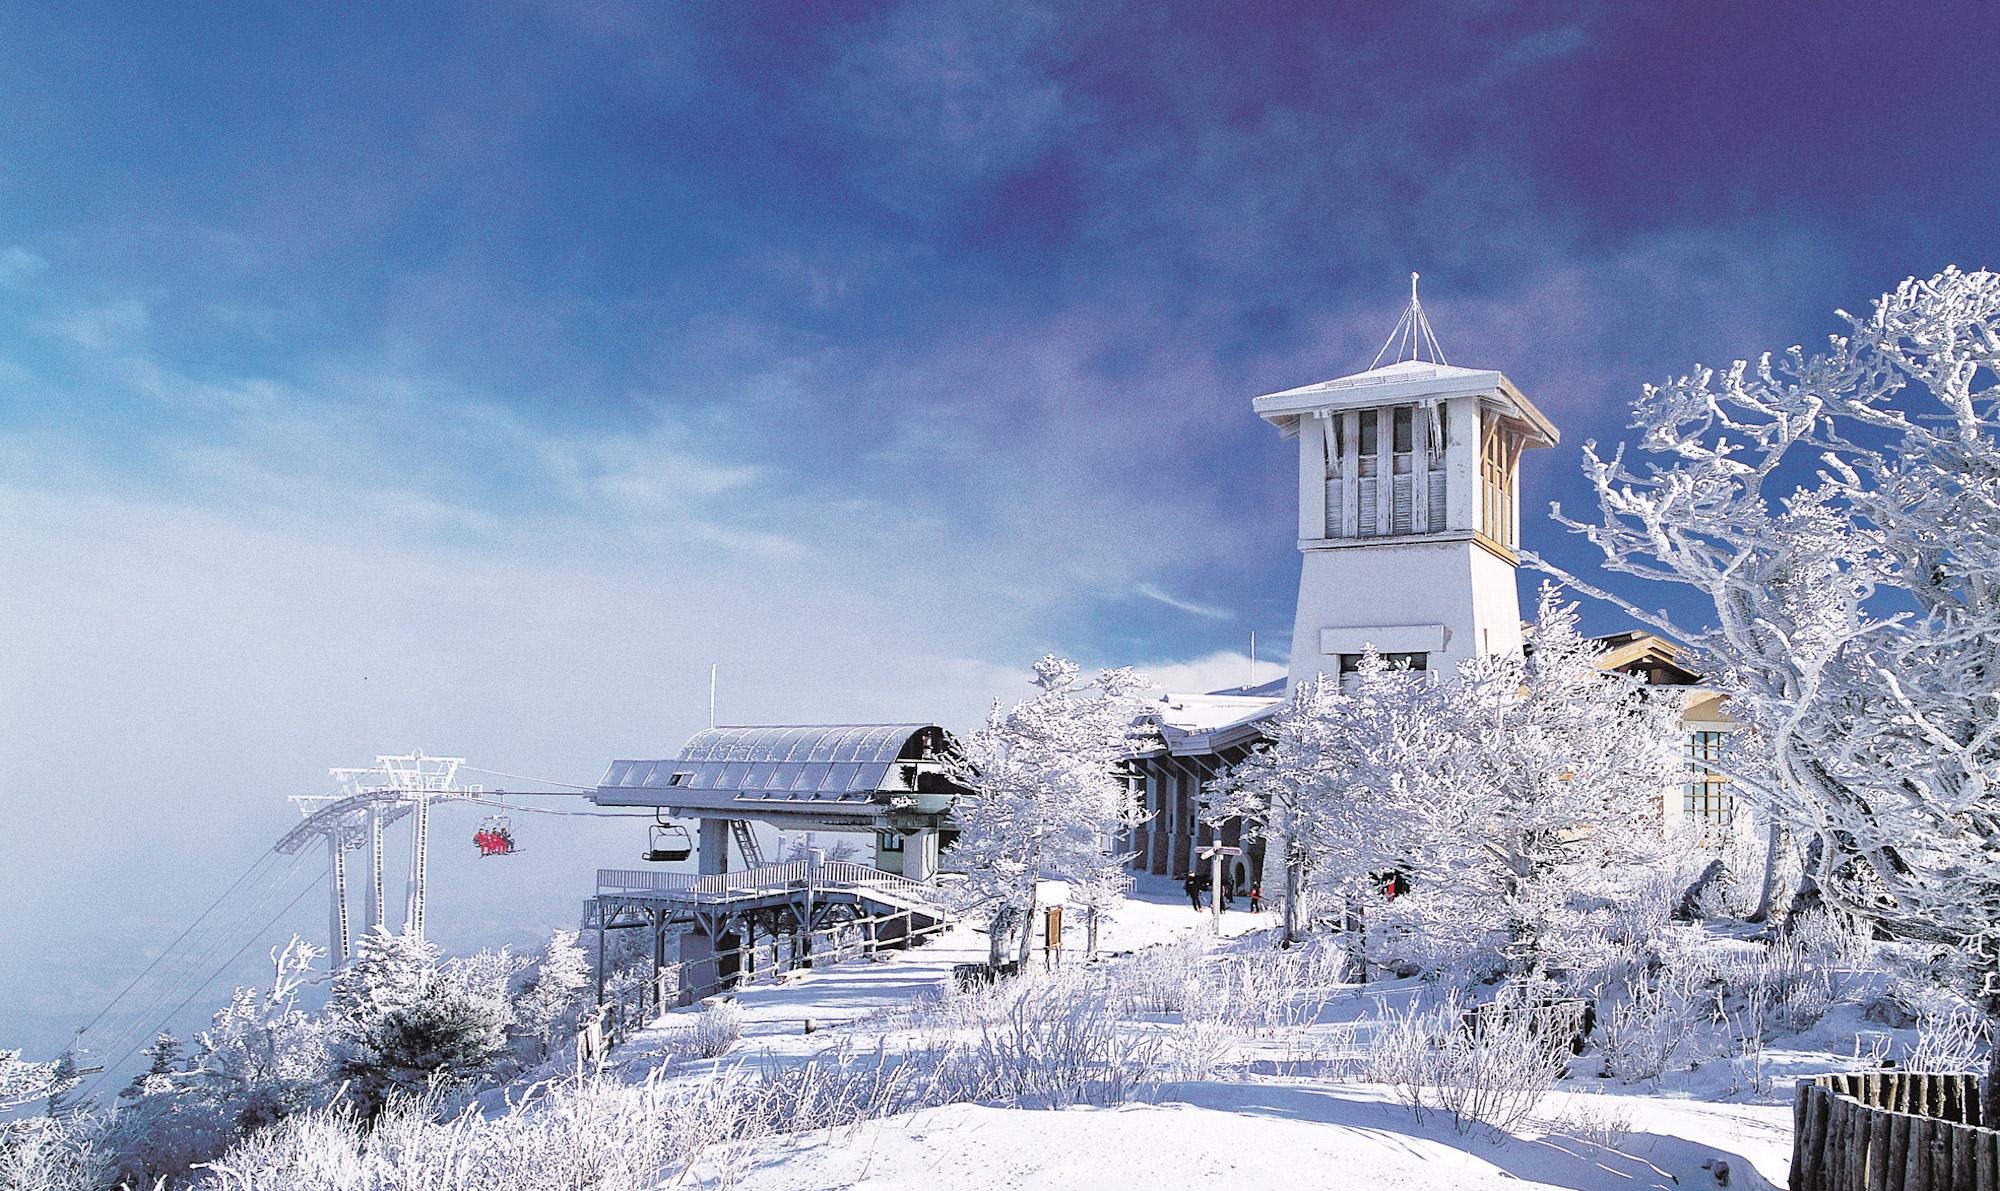 pyeongchang and south korean ski culture | cnn travel